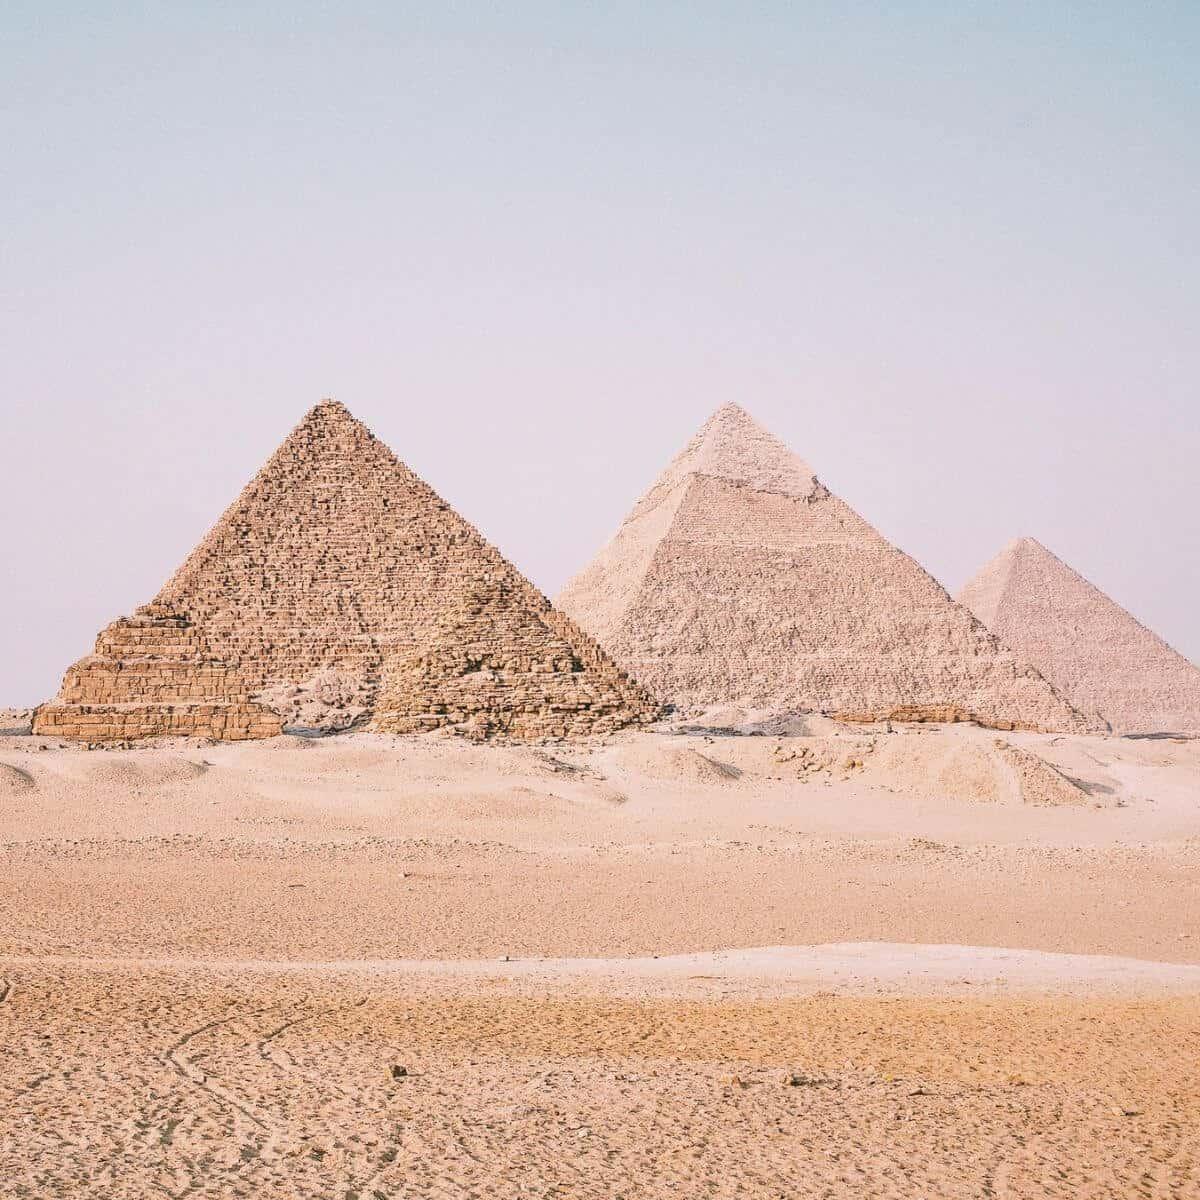 Pyramids of Giza during sunrise.